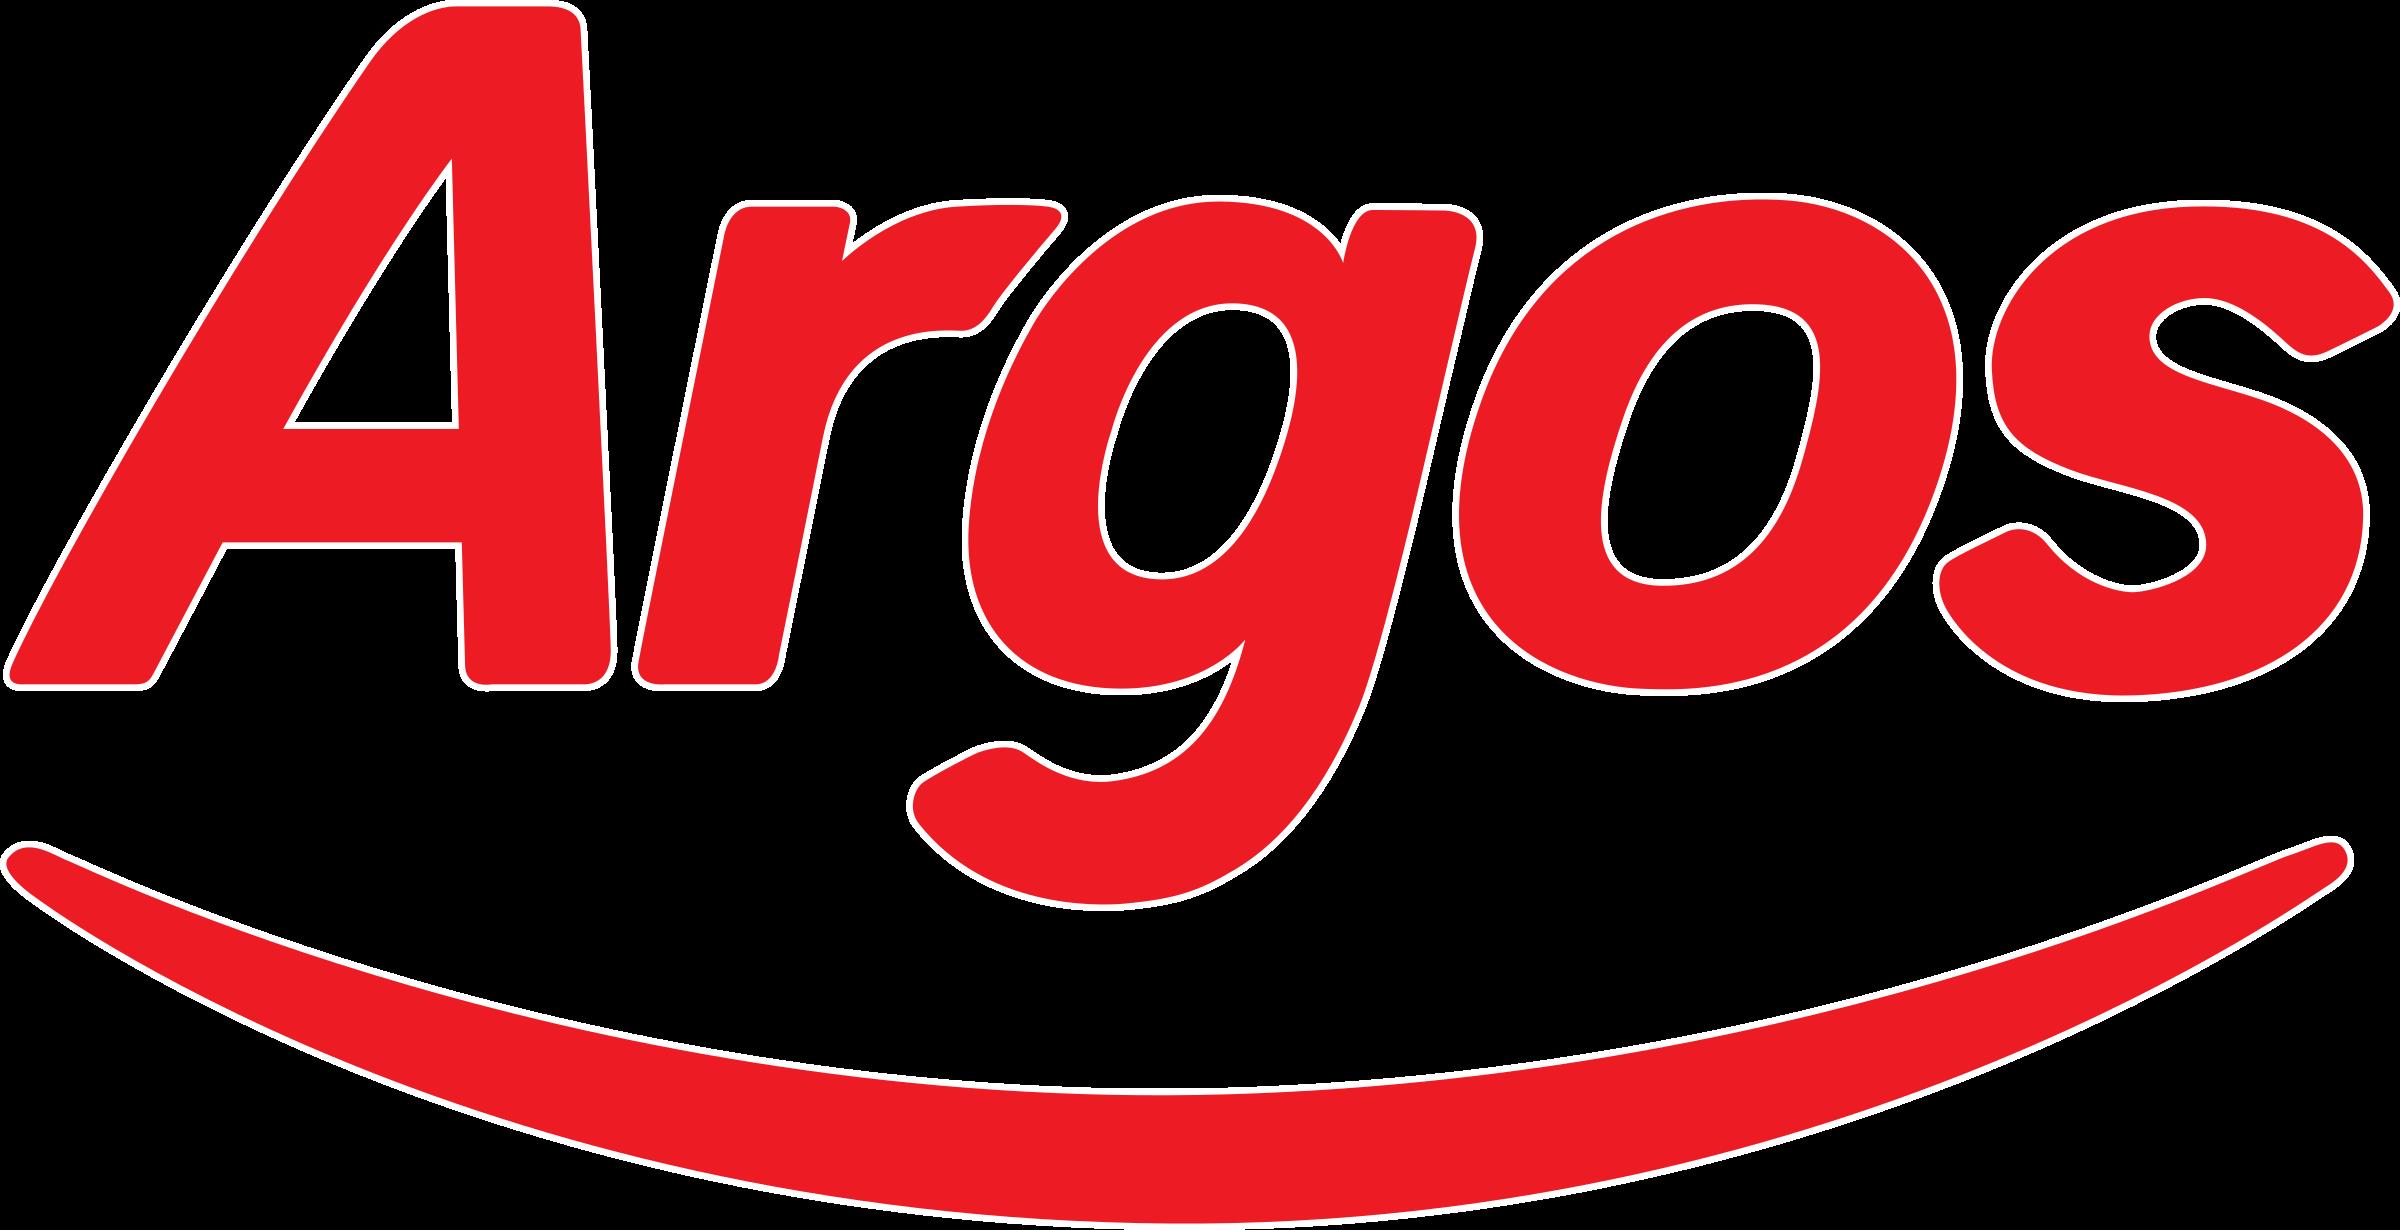 Argos Logo PNG Transparent & SVG Vector.